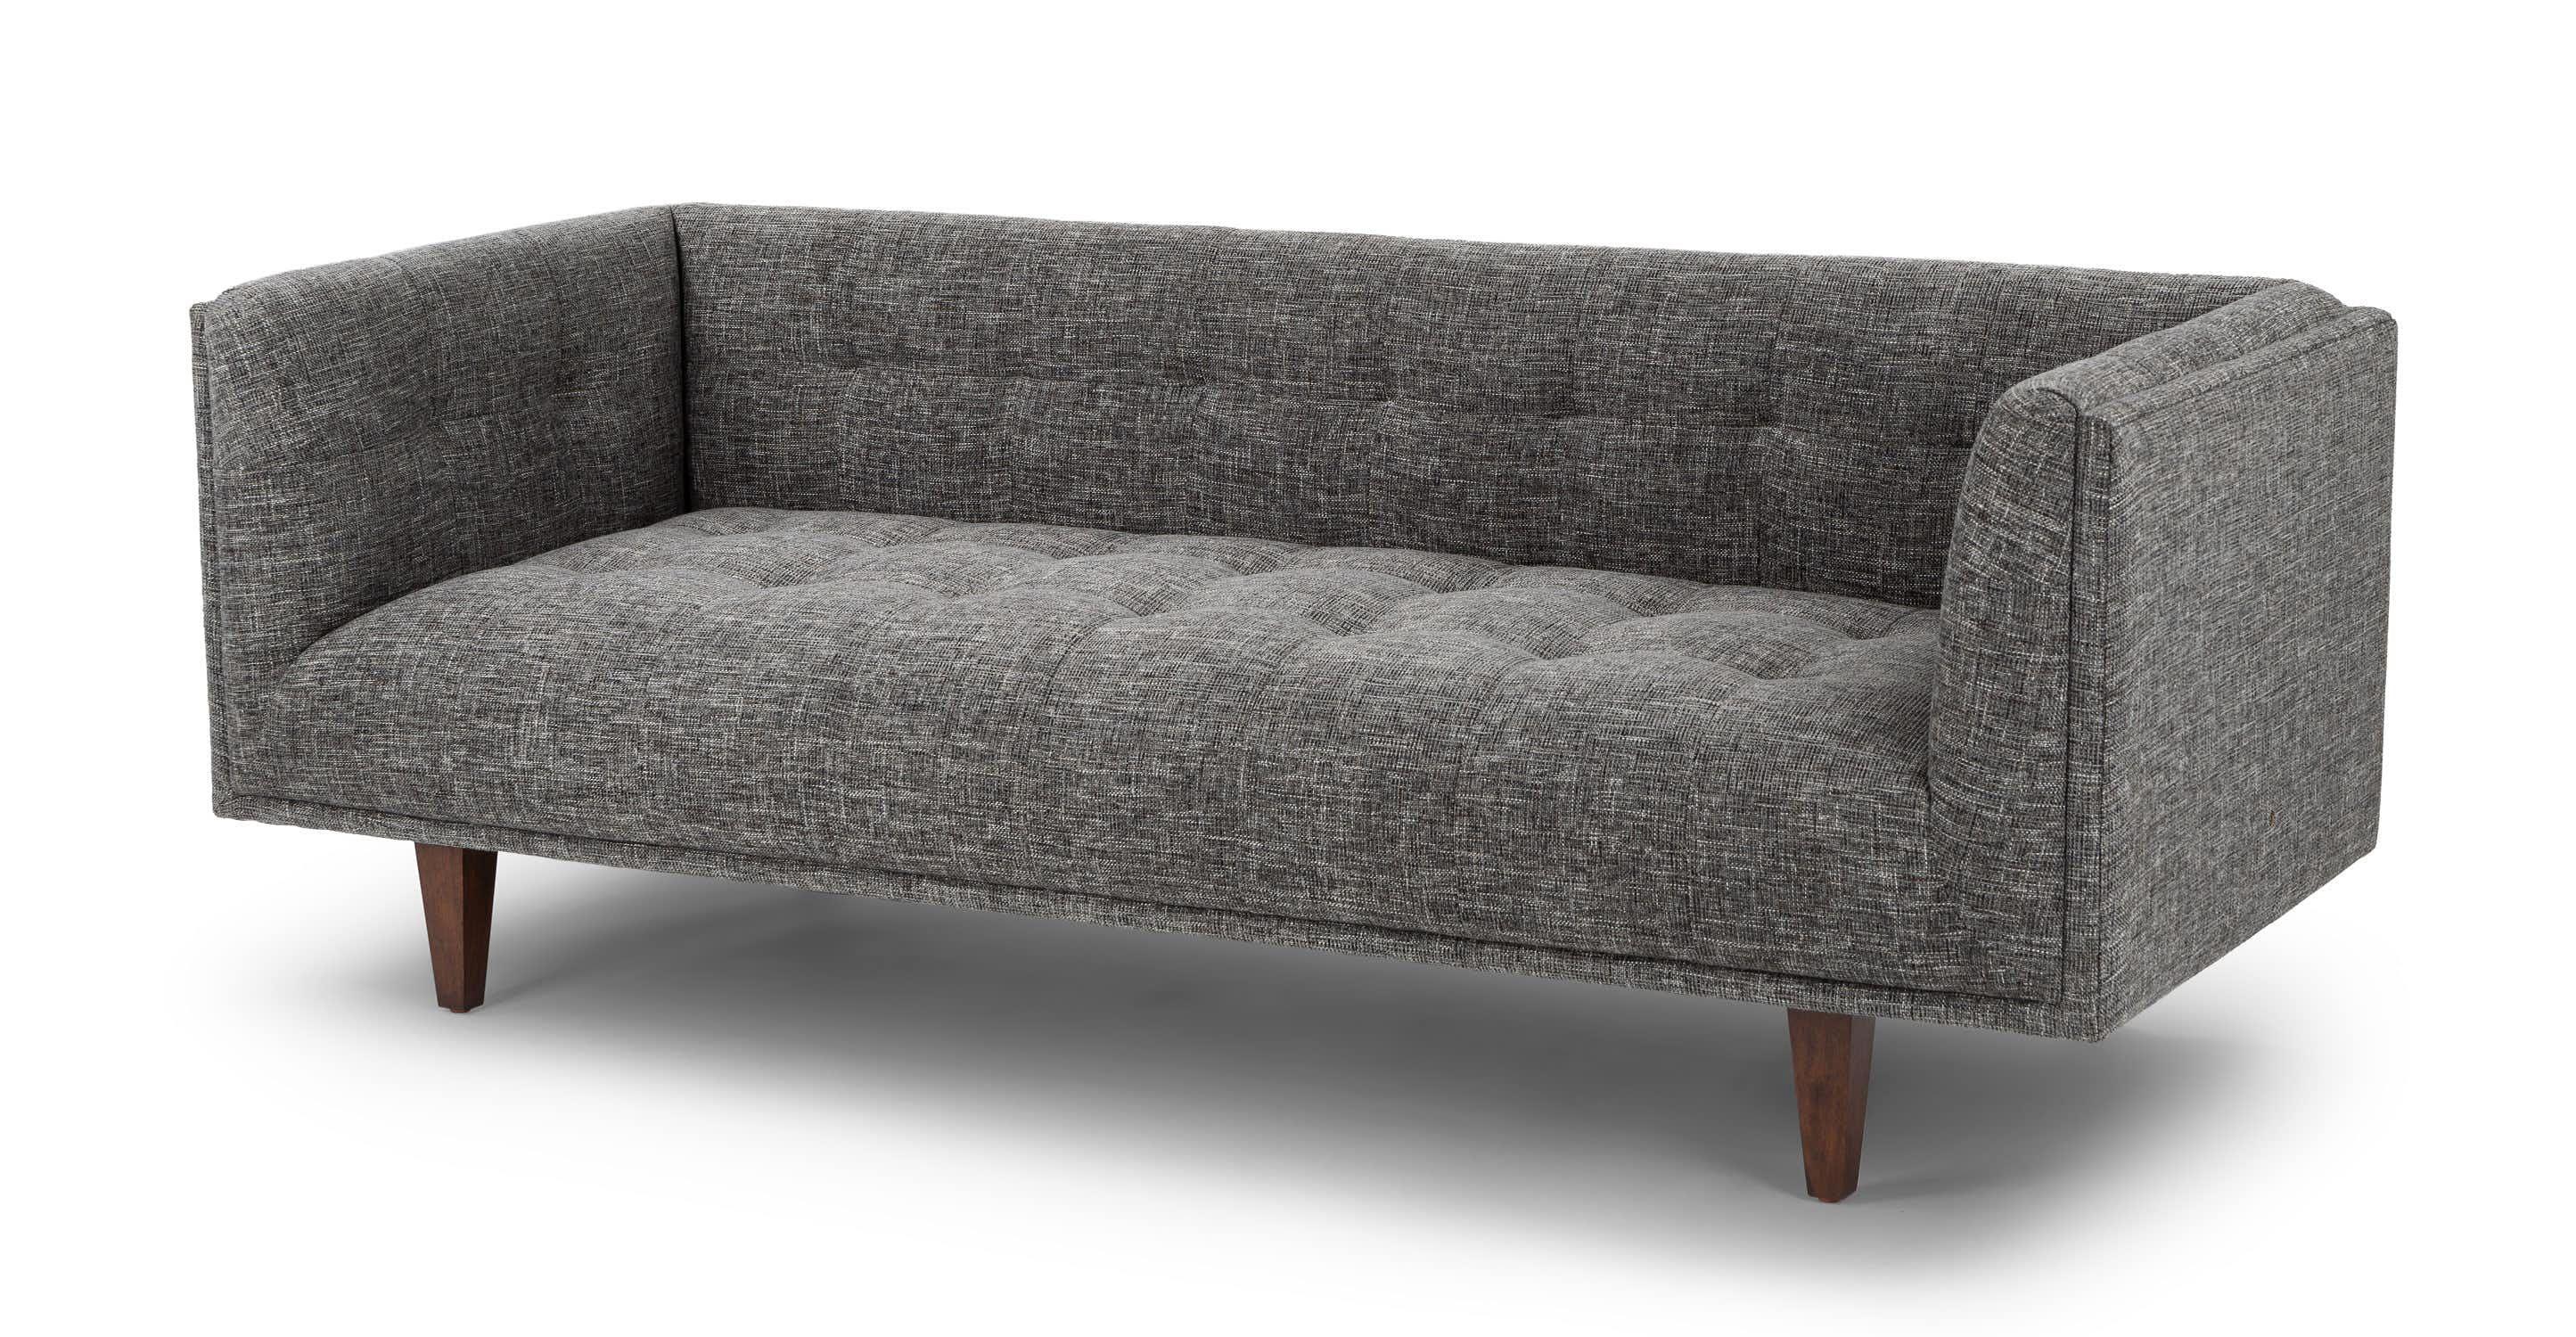 Cirrus Briar Gray Sofa Gray Sofa Green Sofa Sofa [ 1500 x 2890 Pixel ]